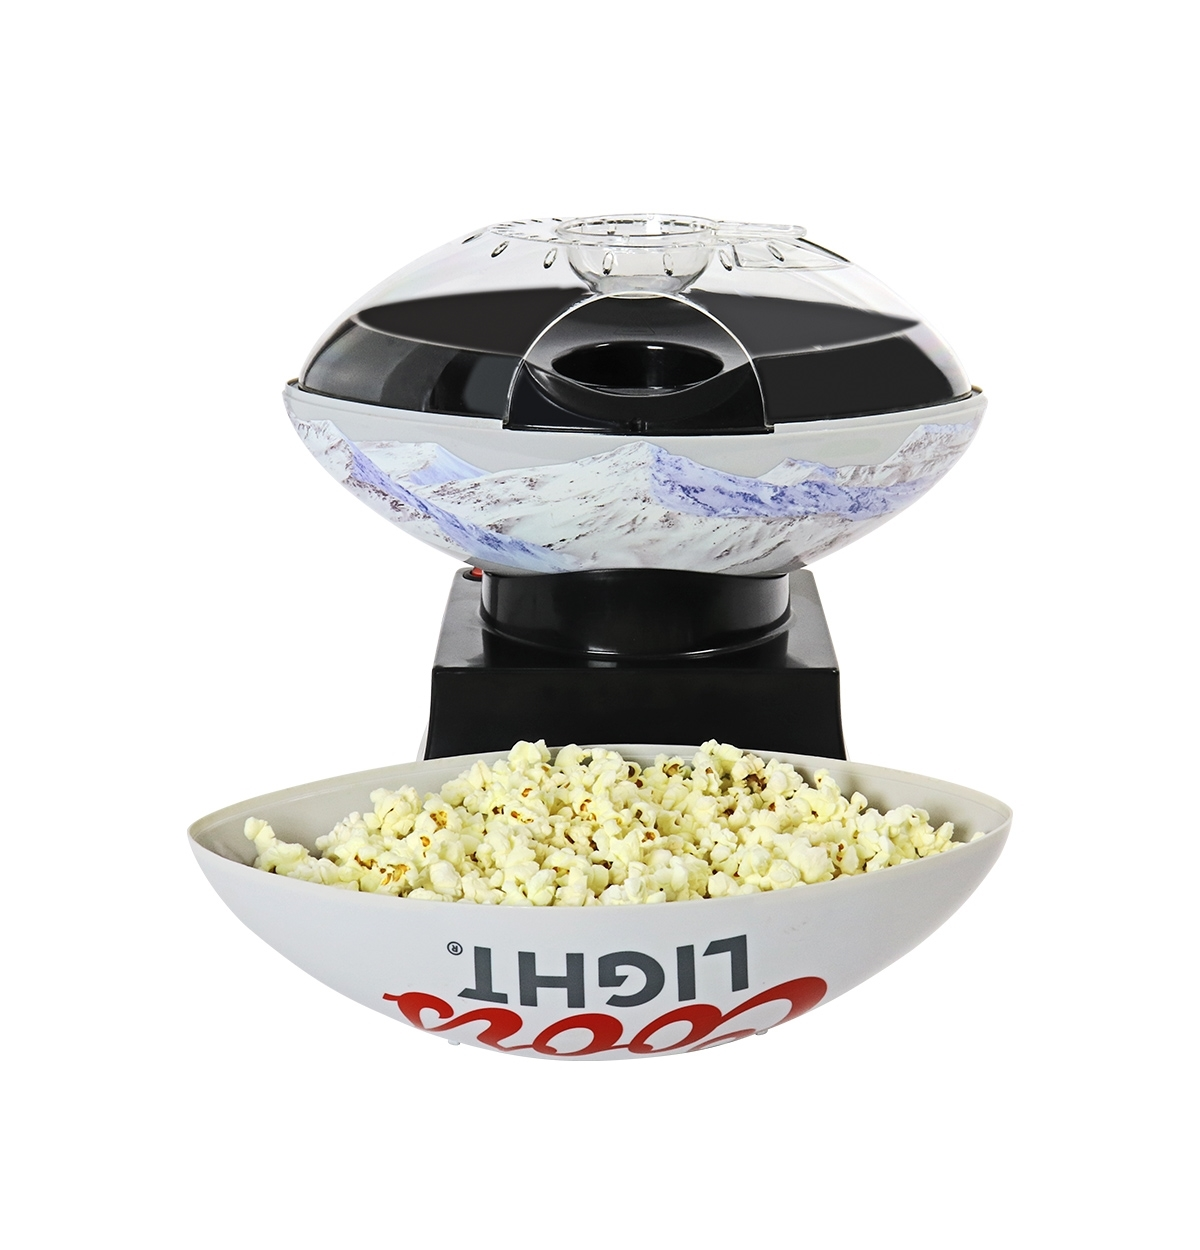 popcorn maker walmart canada